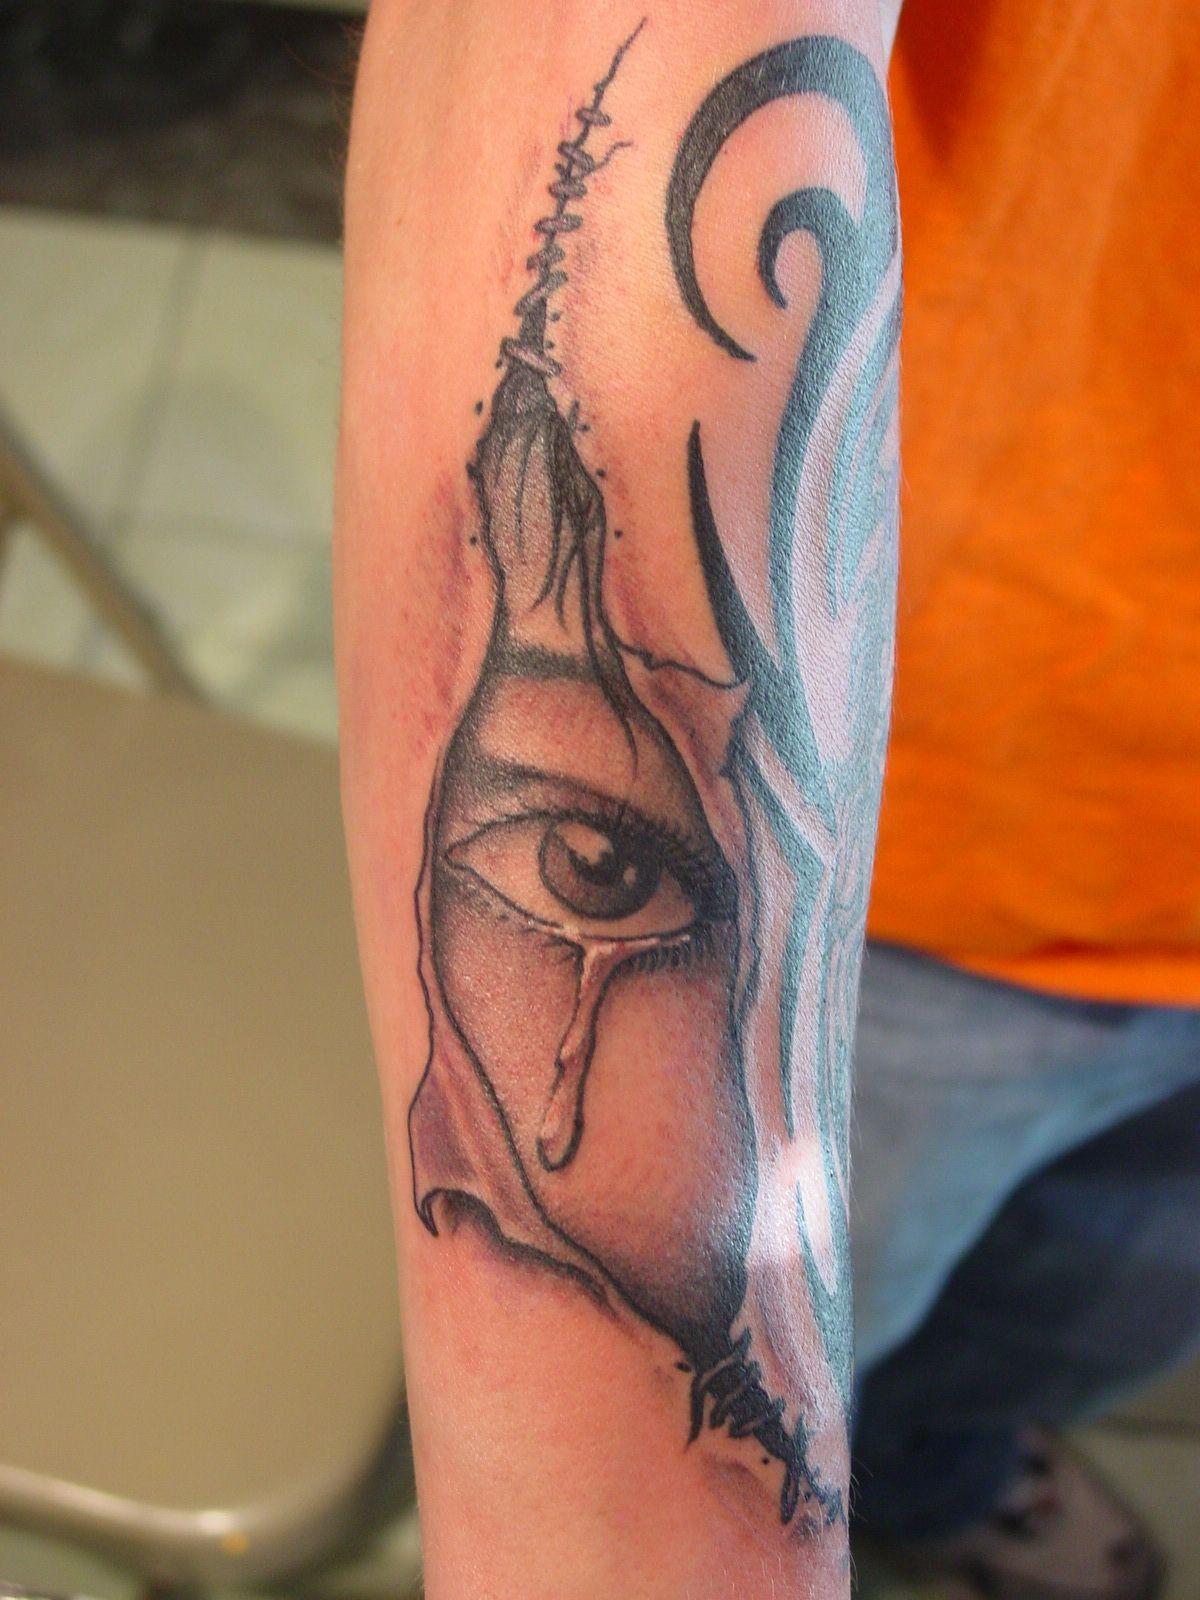 Crying Eye Through Torn Skin By Renegade Fabian Torn Skin Tattoo Design Art Flash Pictures Images Gallery Sym Ripped Skin Tattoo Skin Tear Tattoo Tattoos